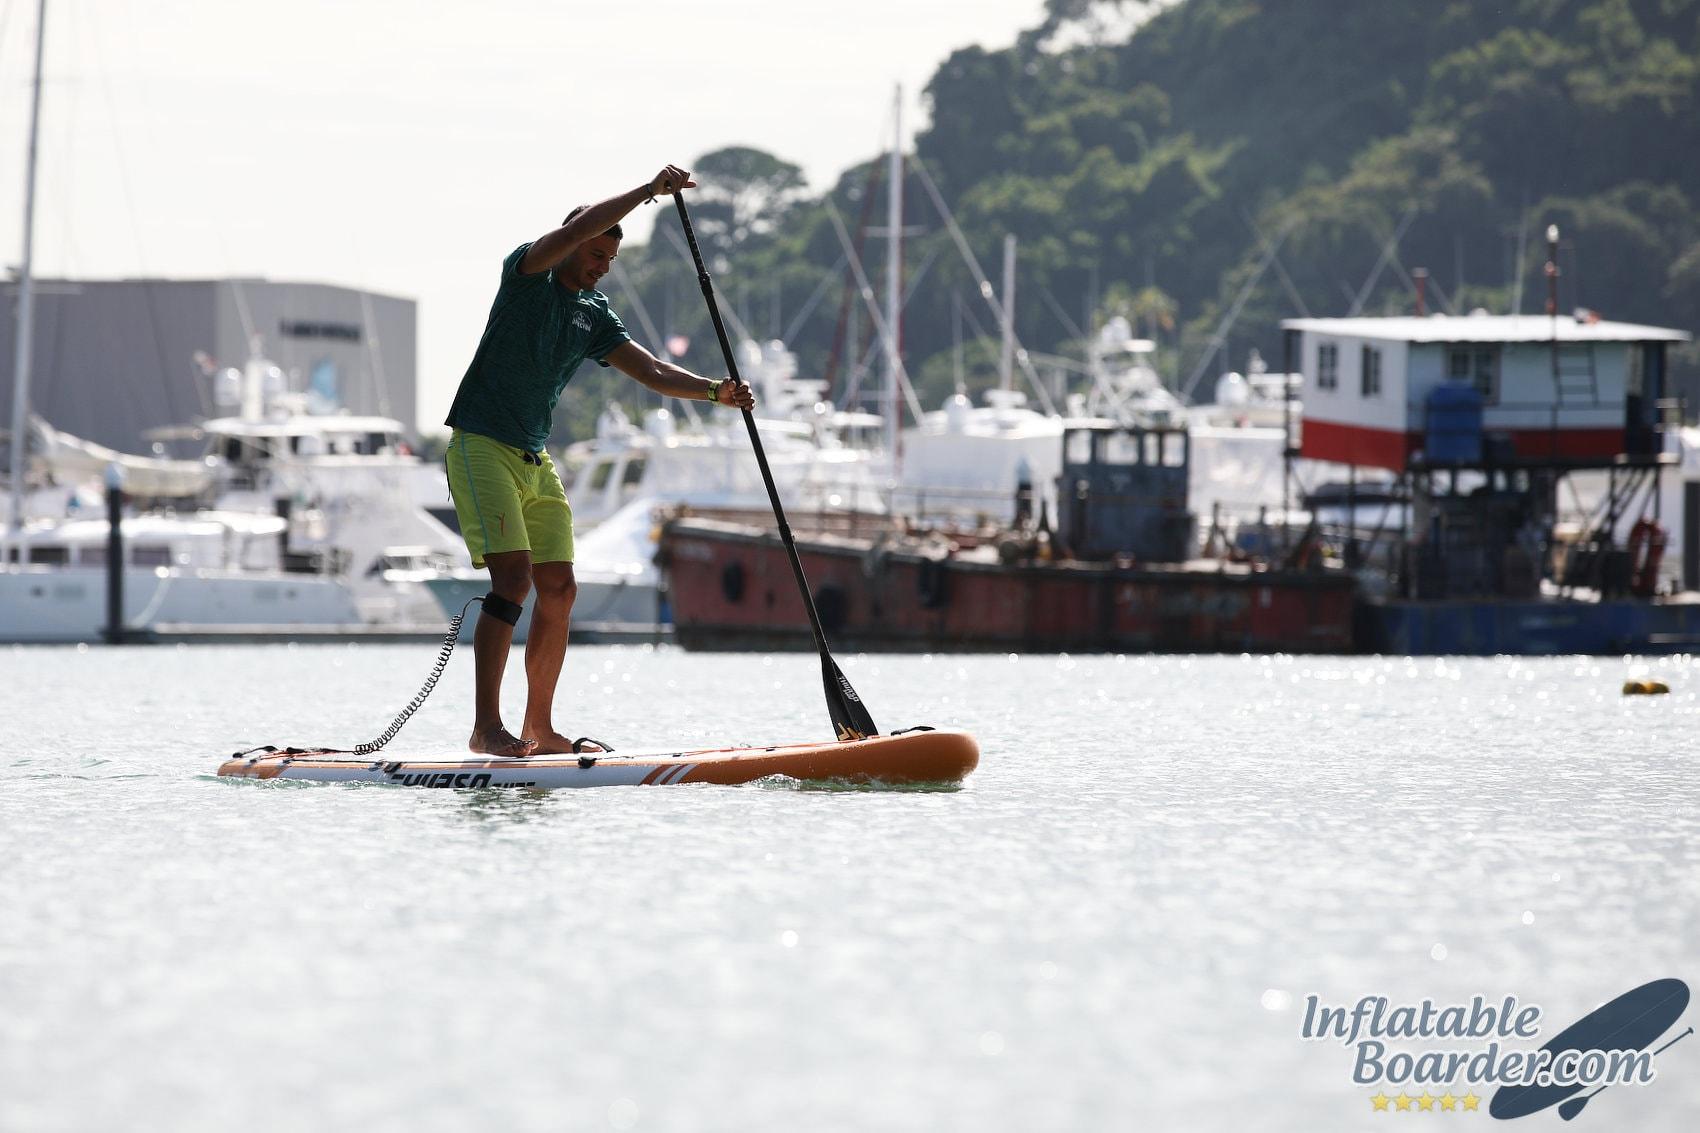 Paddling THURSO WW120 Inflatable Paddle Board